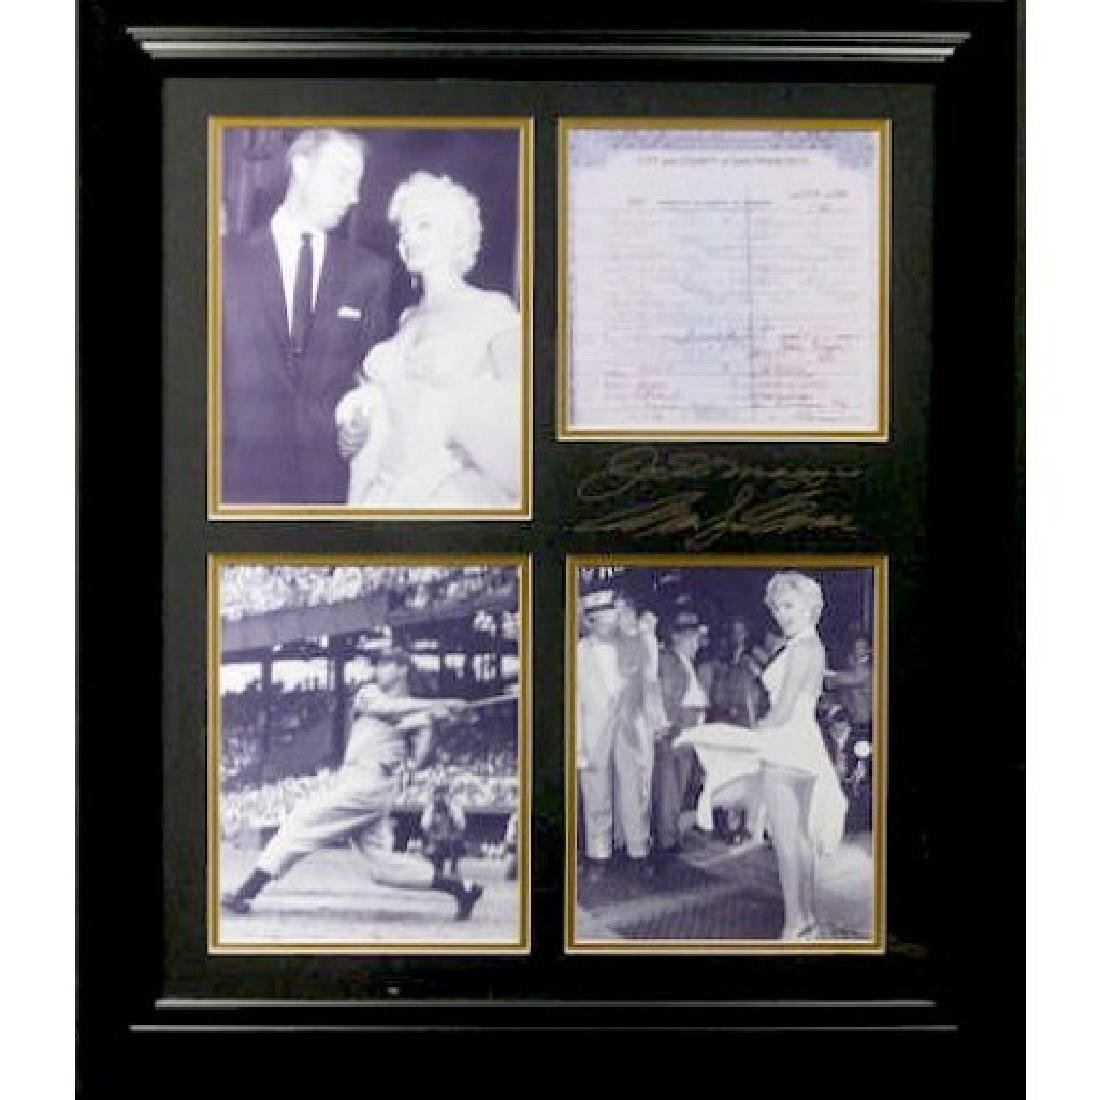 Marilyn Monroe & Dimaggio - Plate Signatures